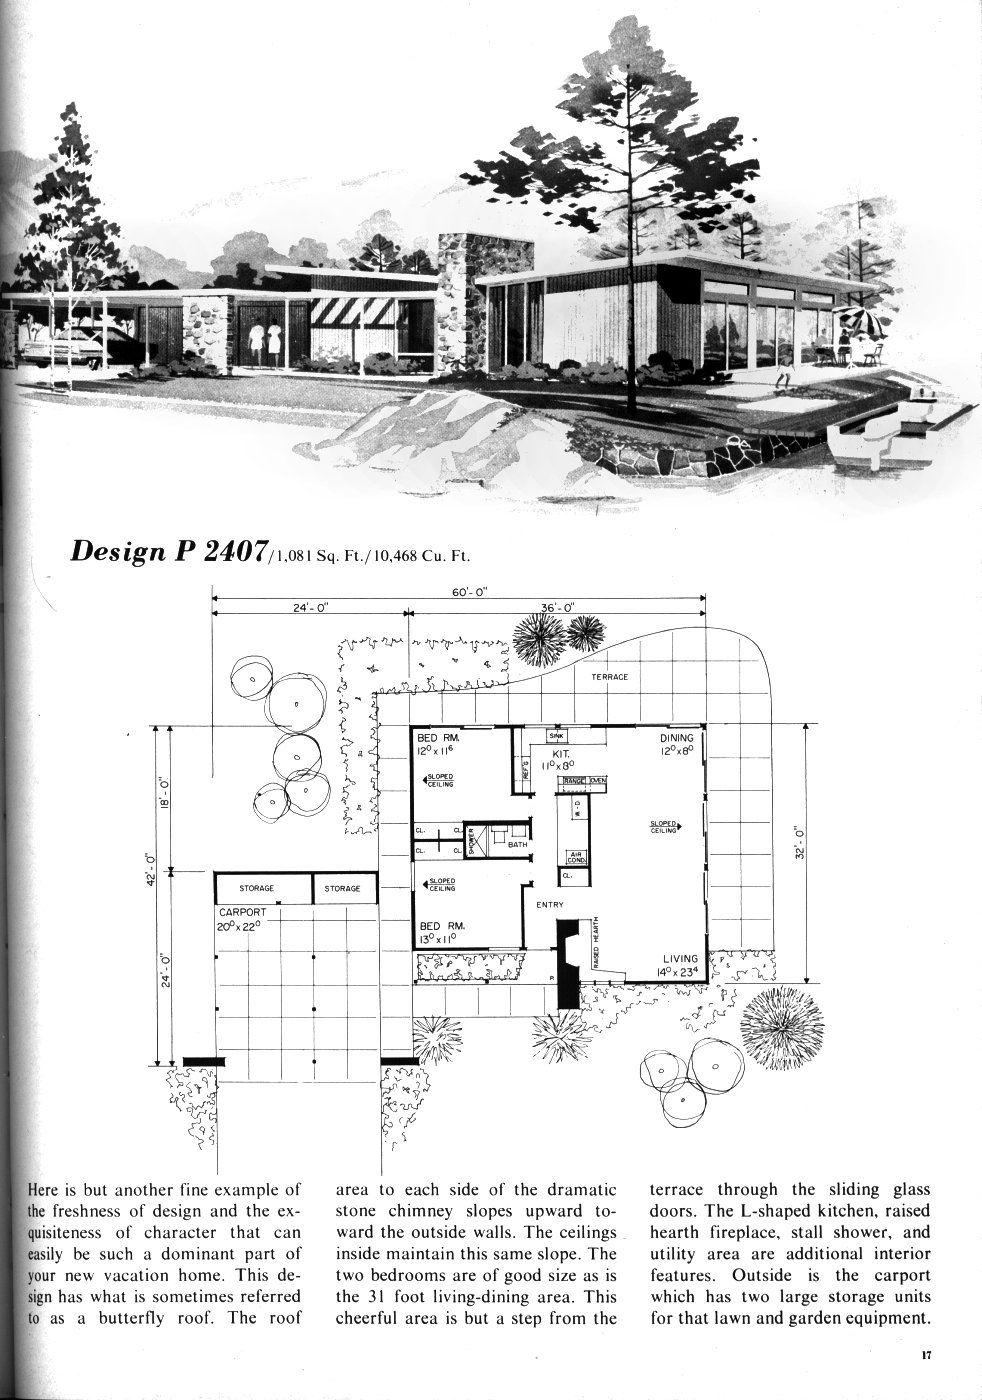 Mid Century Modern! Turn carport into full garage. Expand